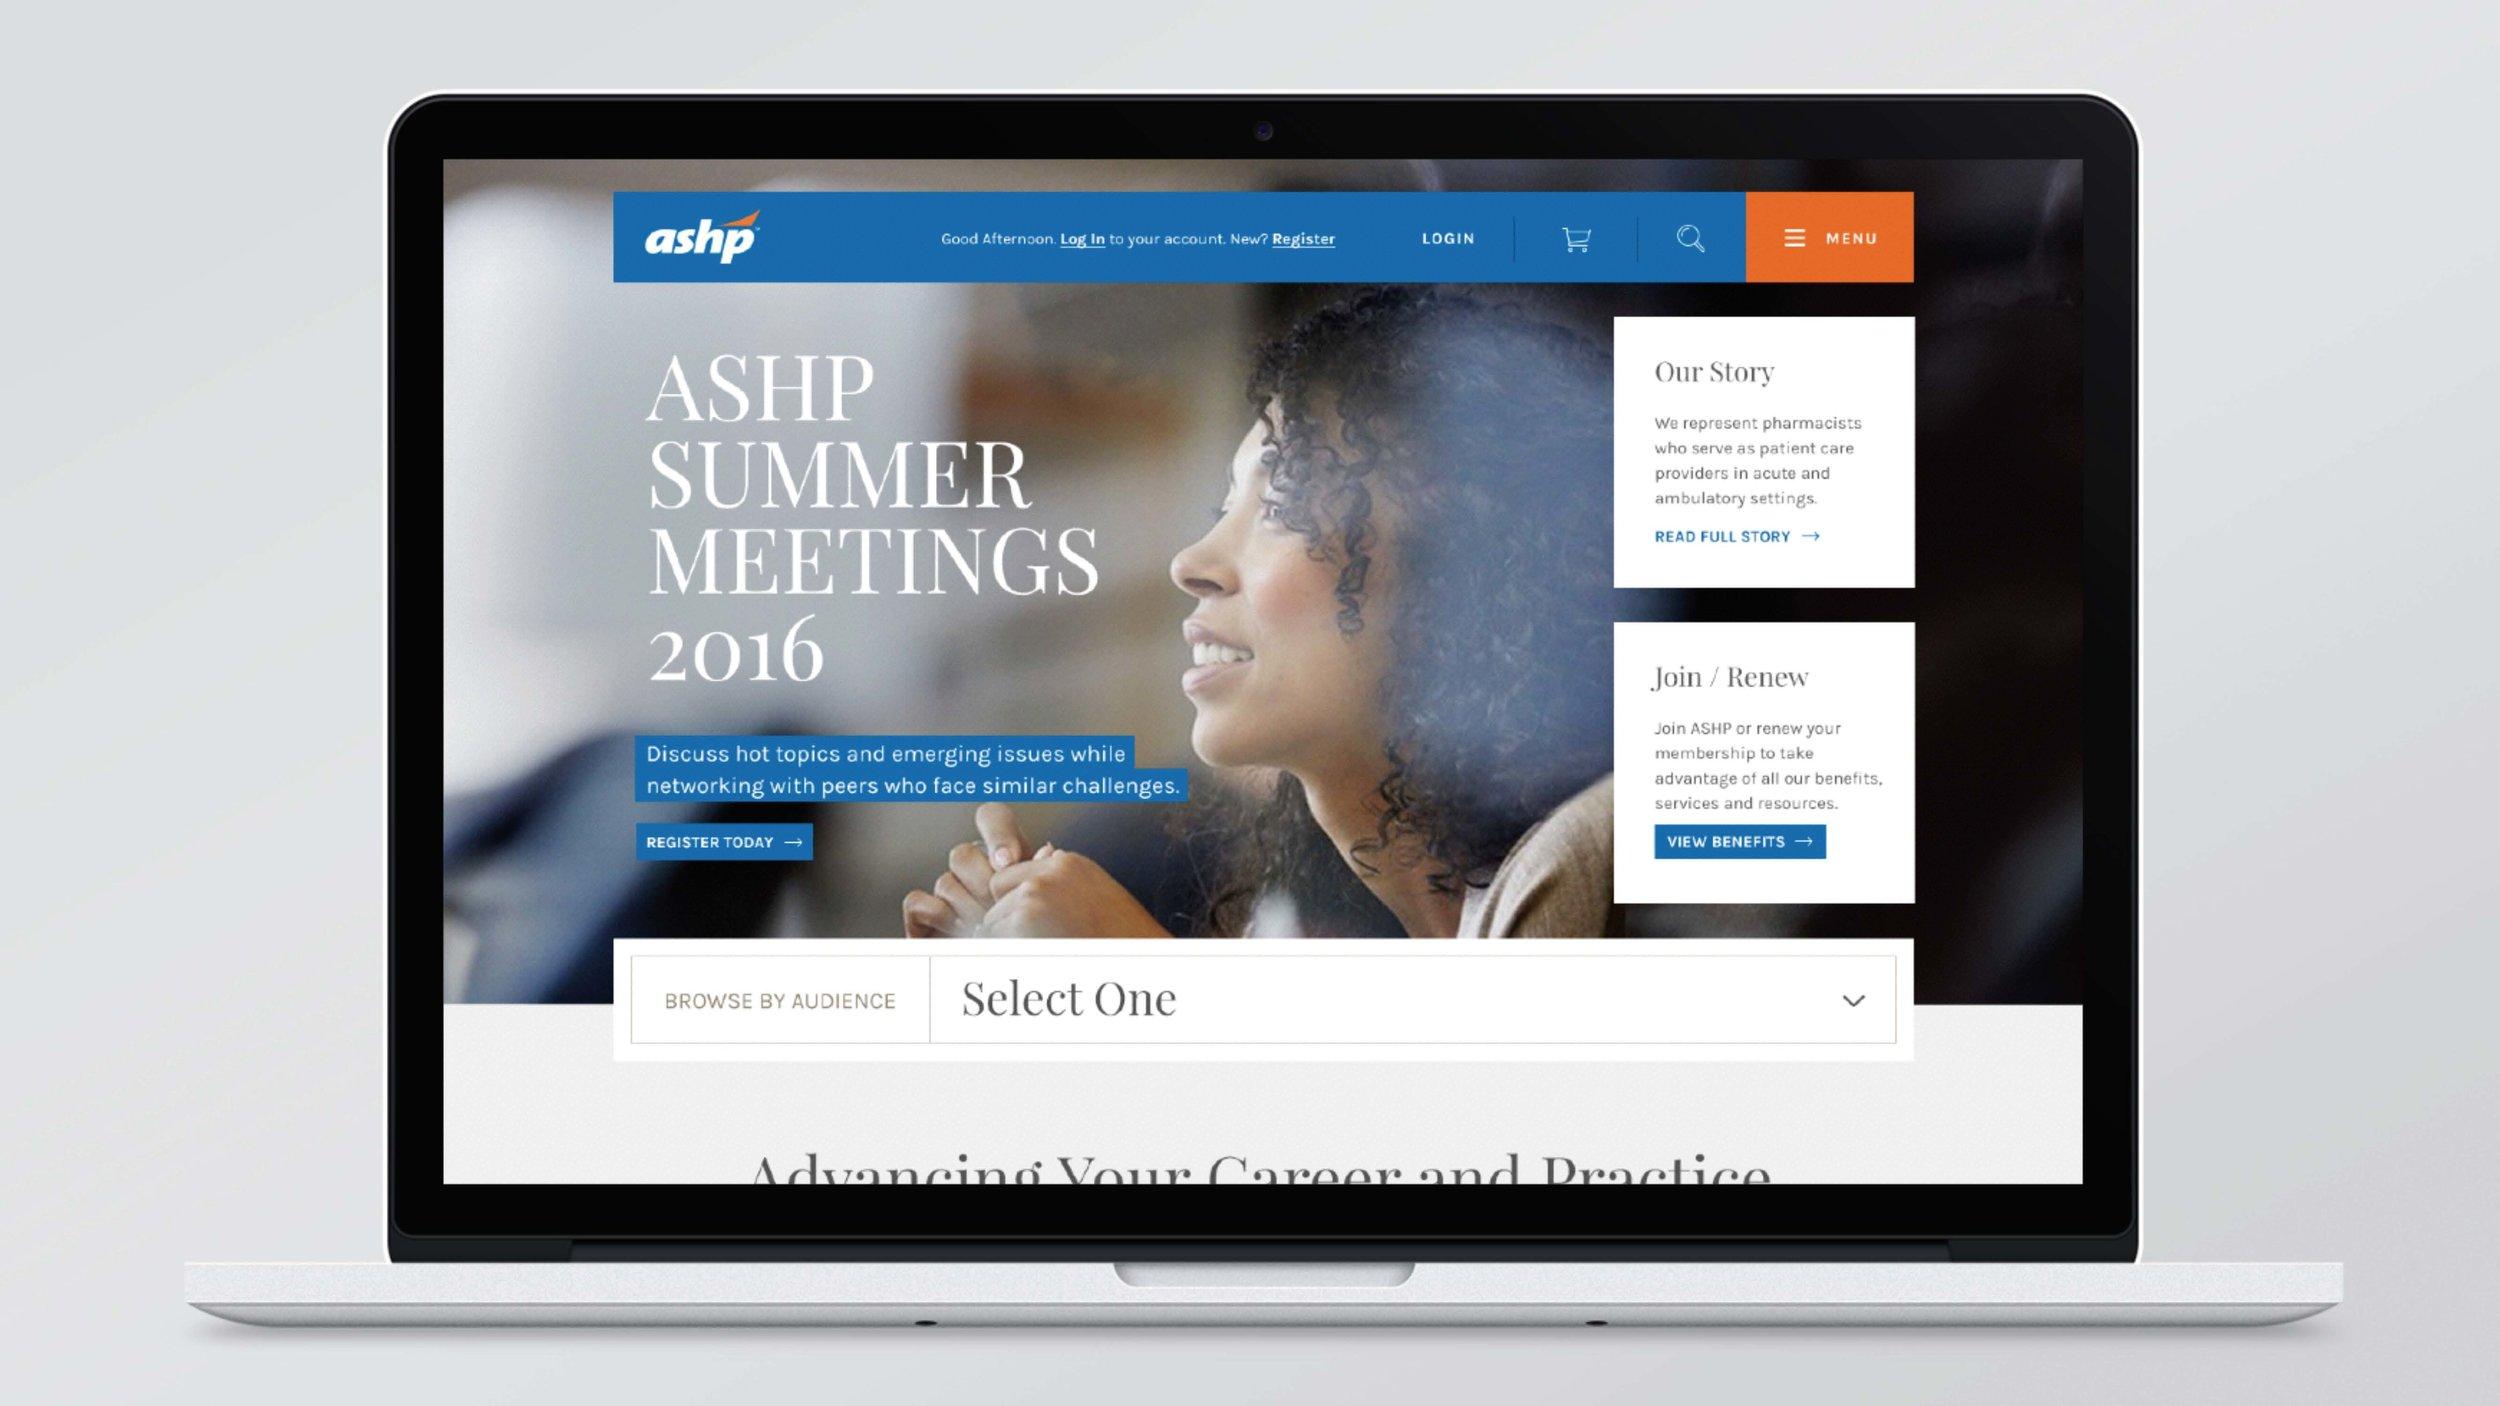 ASHP_Home_Page_26.jpg